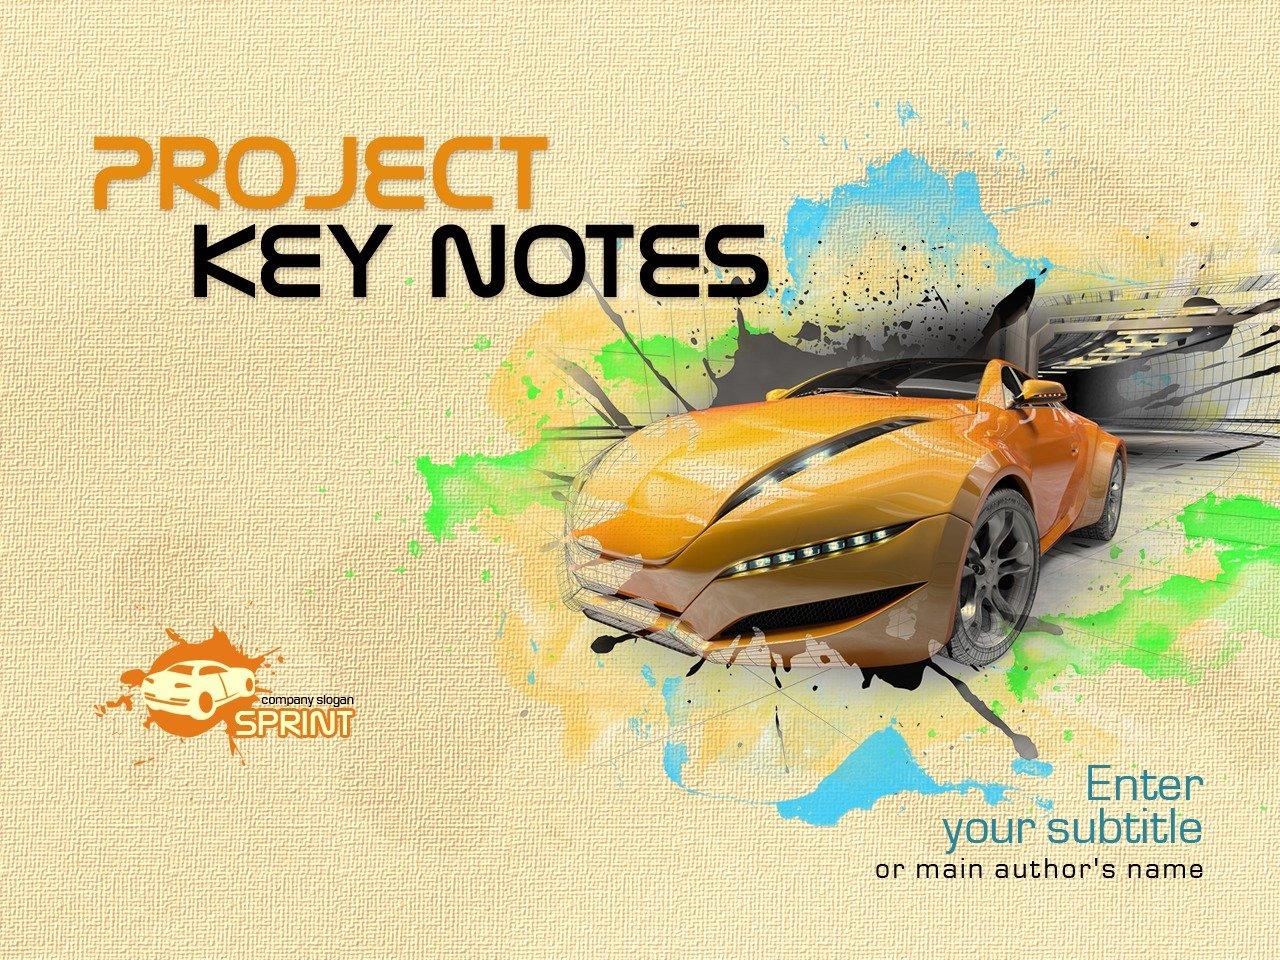 PowerPoint šablona Autoprodejce #33104 - screenshot